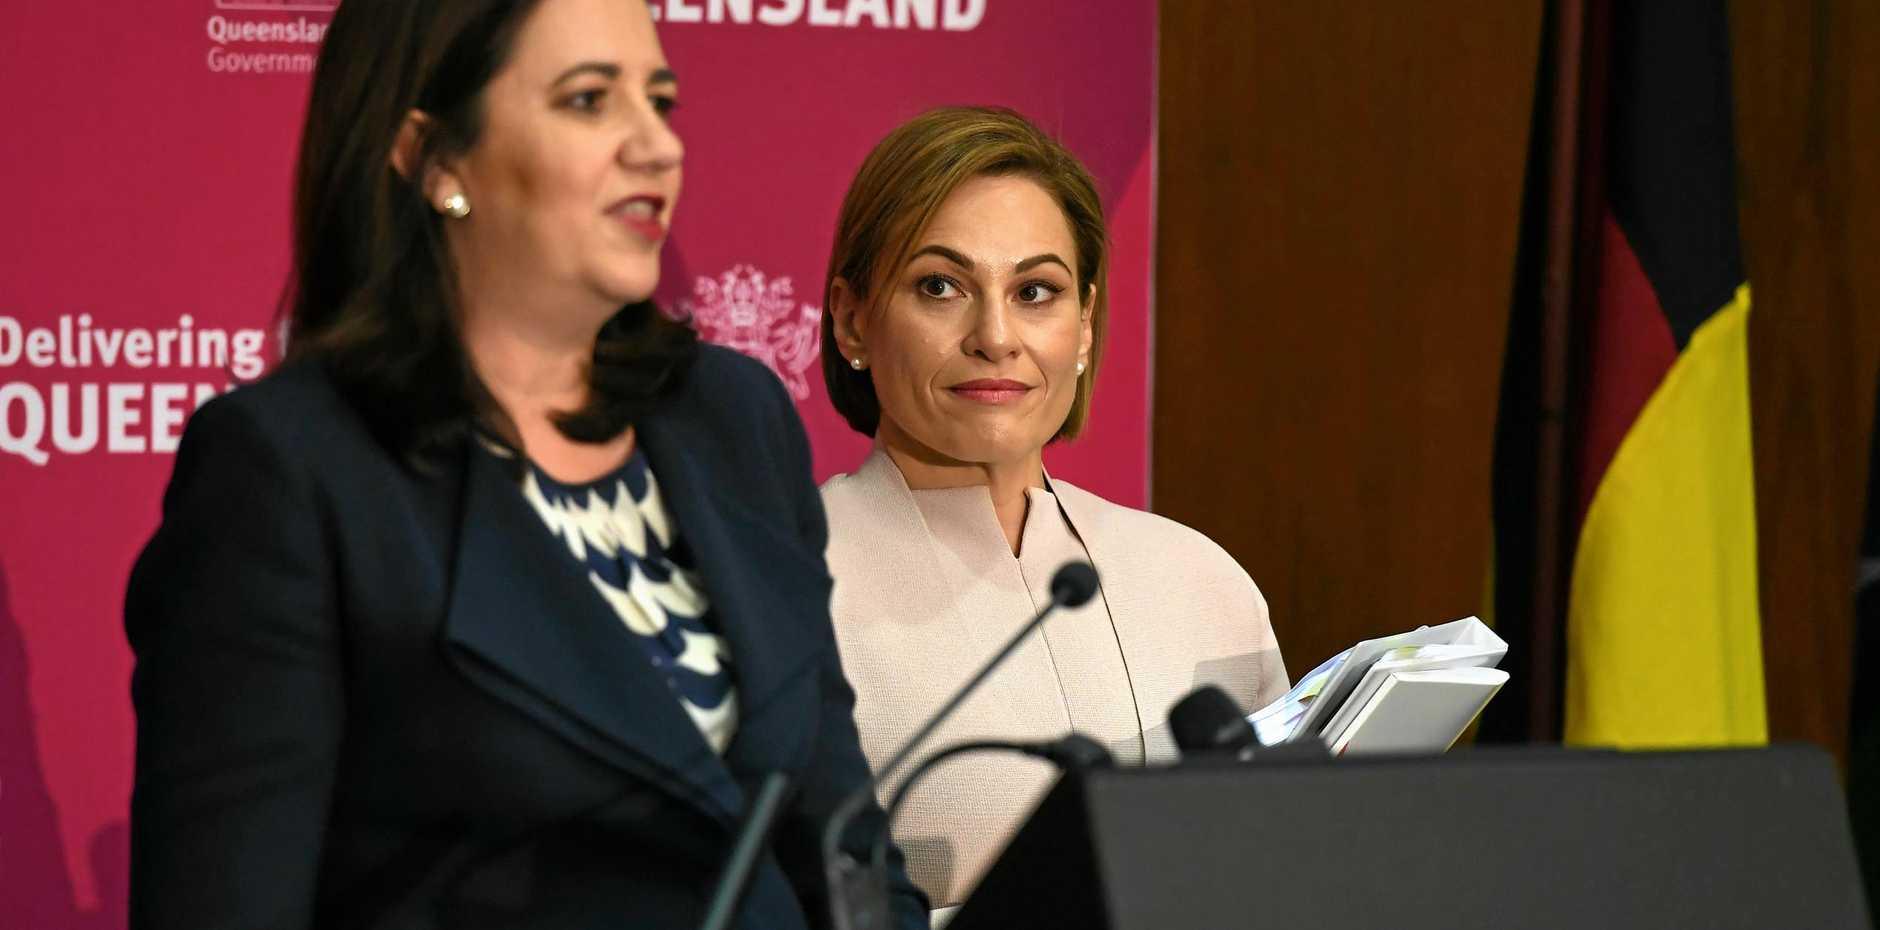 Queensland Premier Annastacia Palaszczuk and Treasurer Jackie Trad.